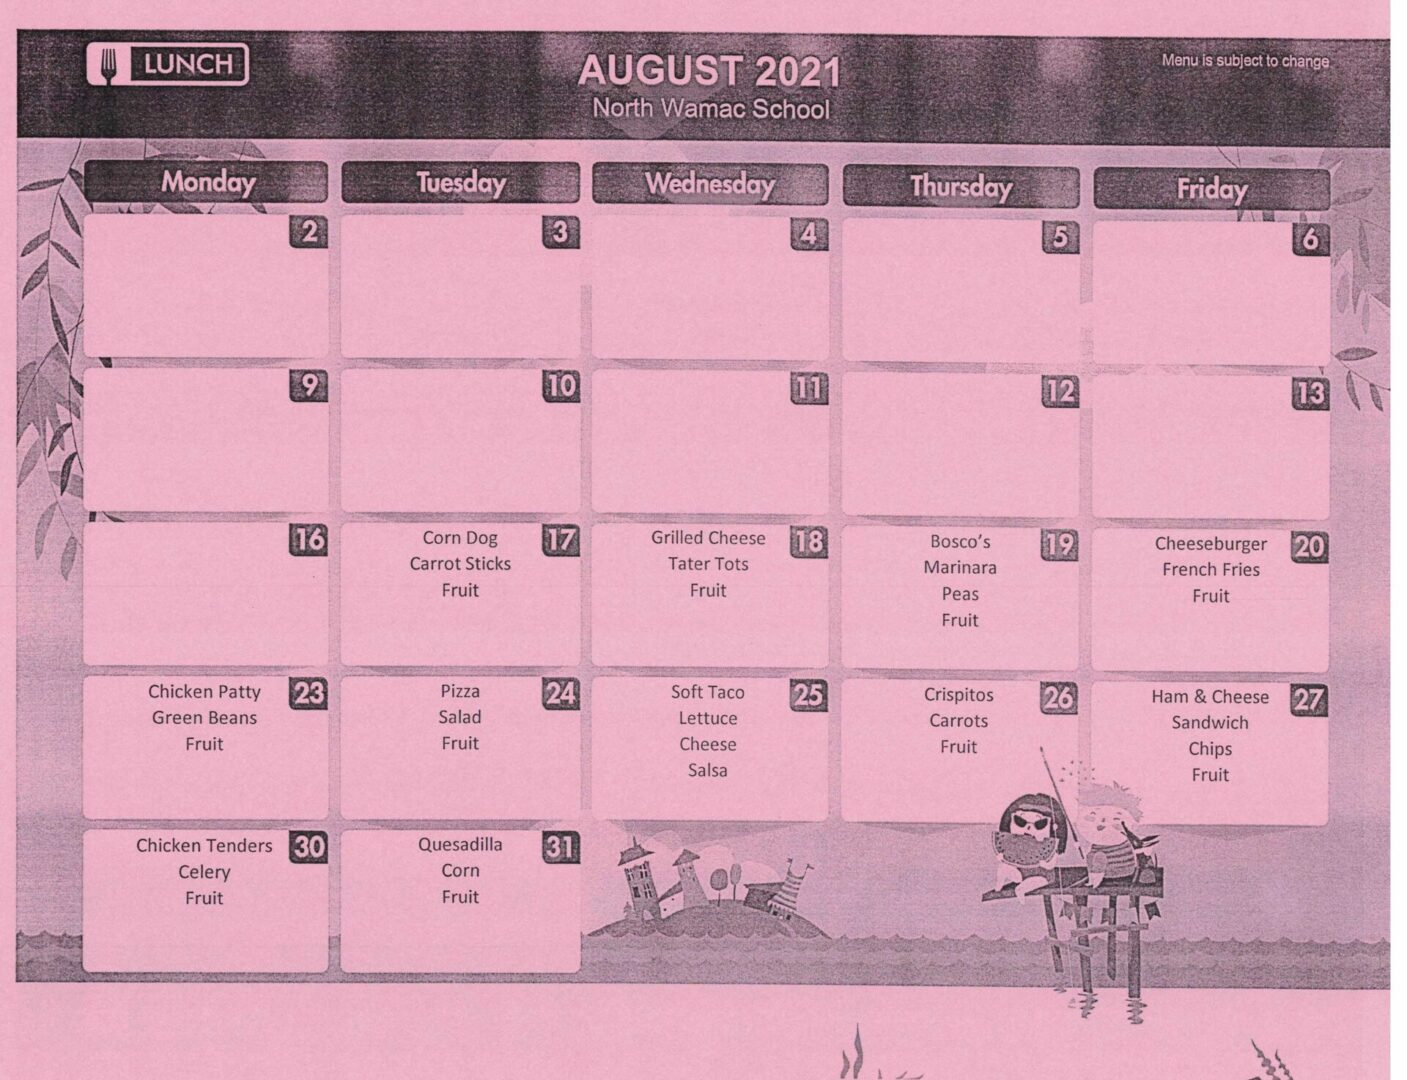 Aug 2021 Lunch menu